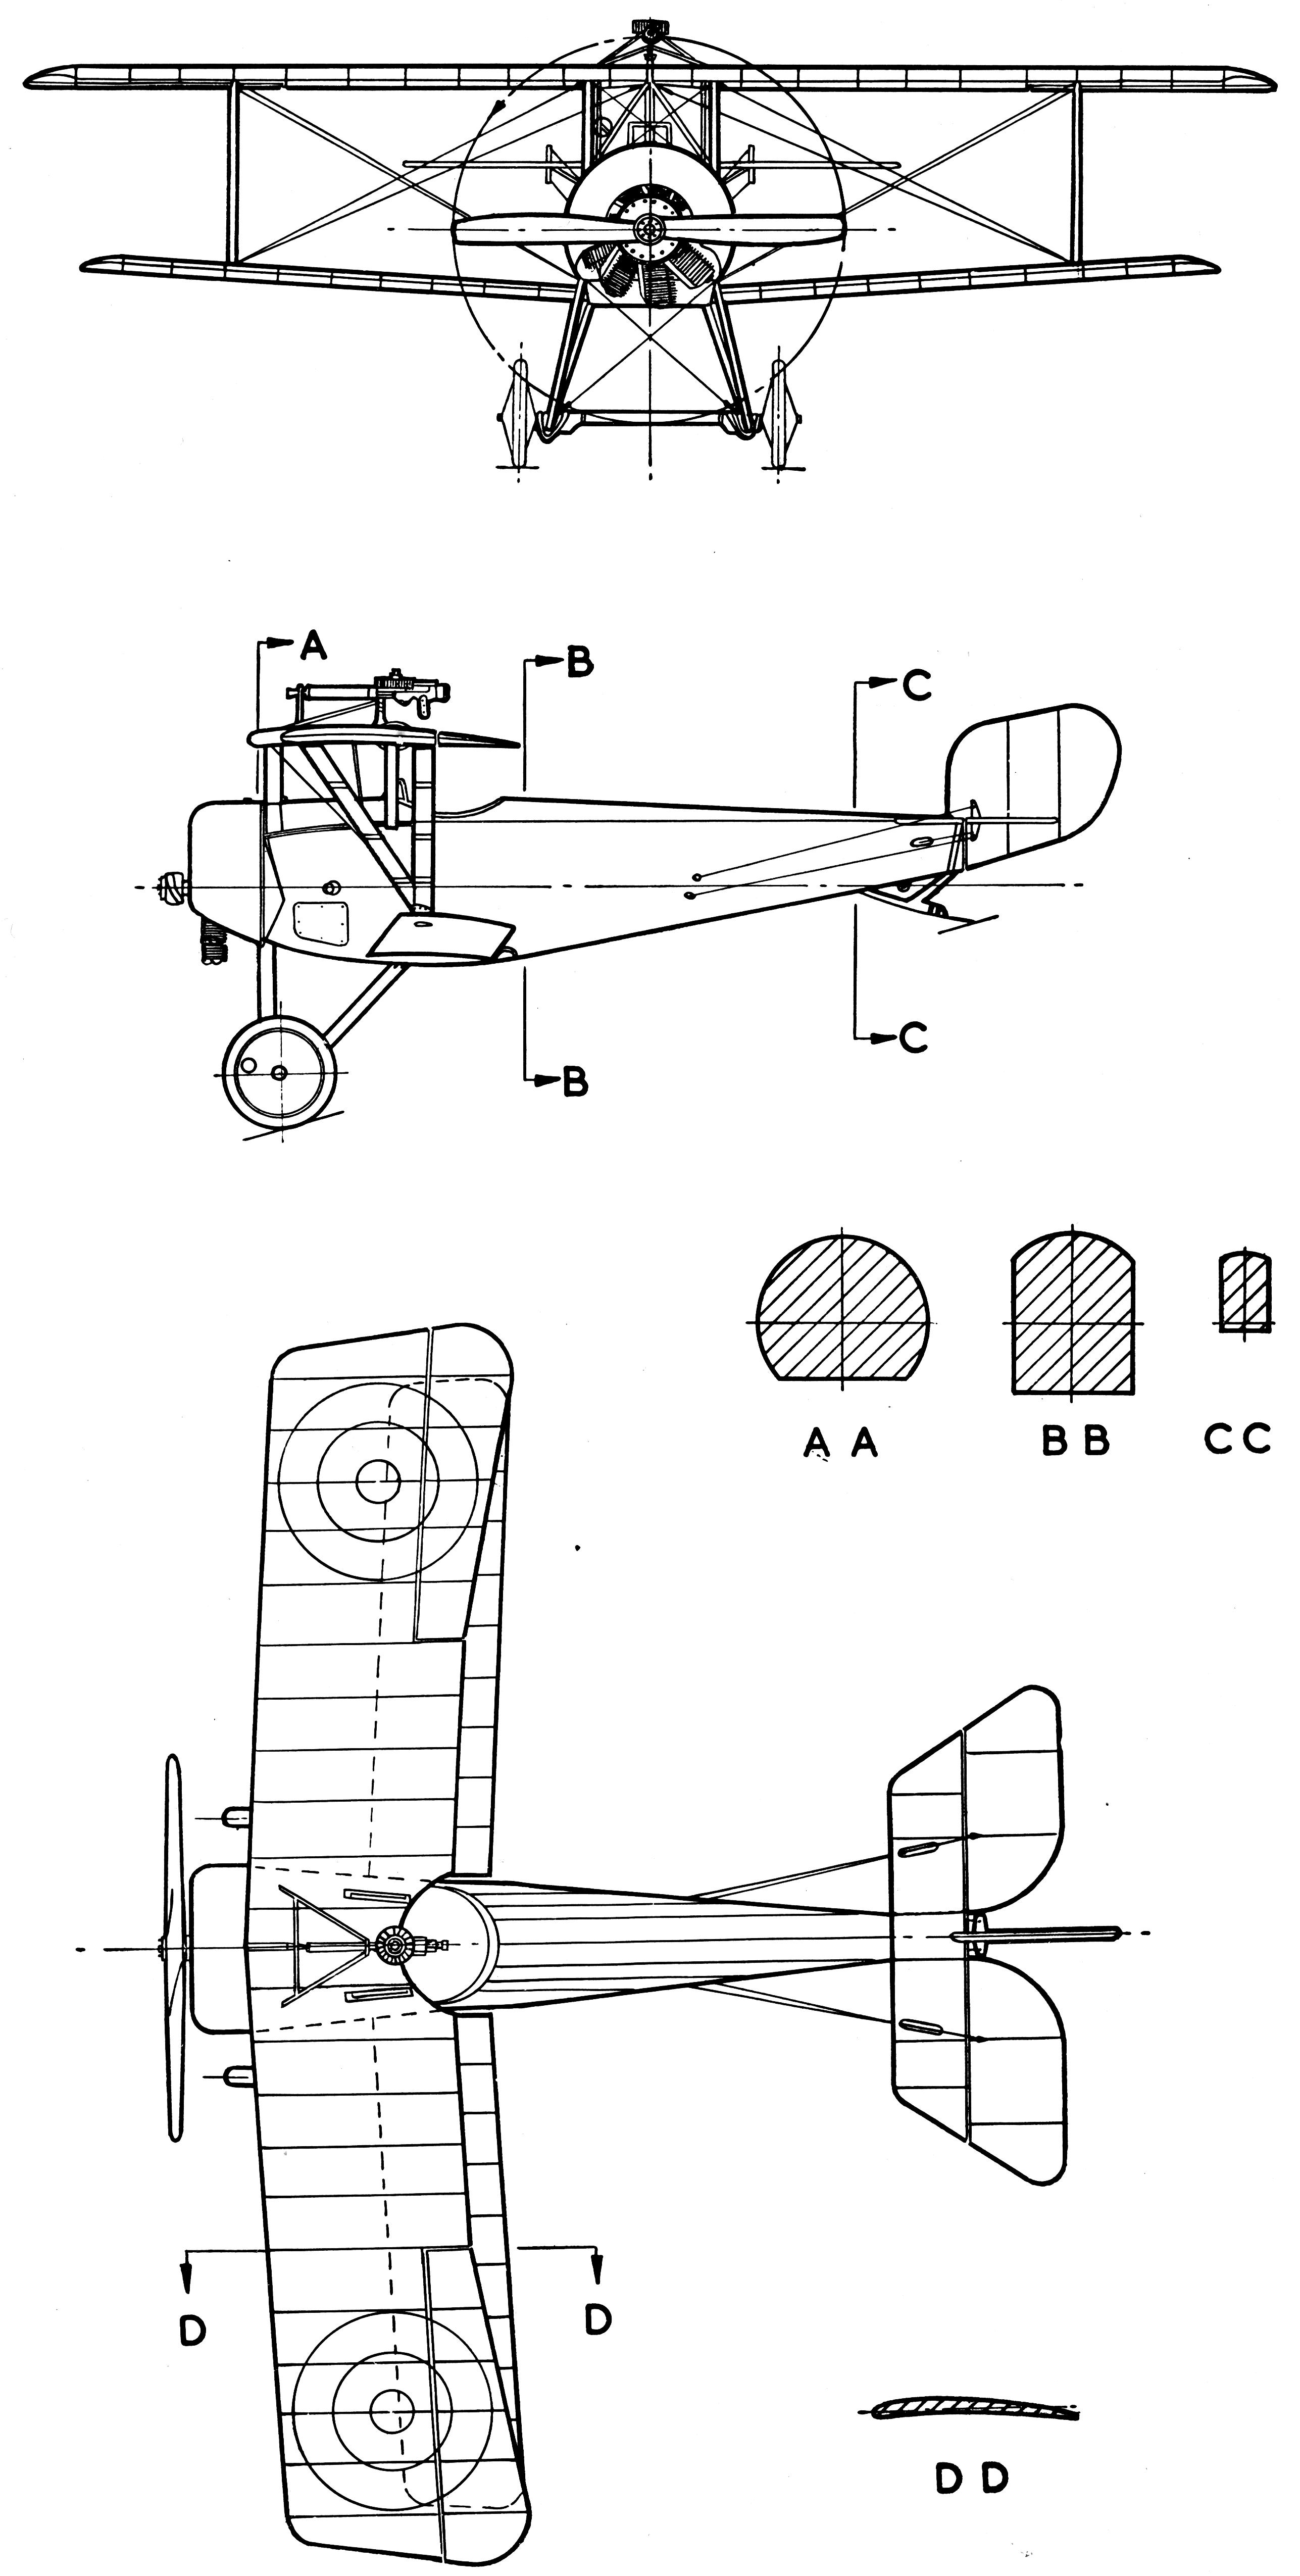 Nieuport 11 blueprint | Blueprints | Model airplanes, Model